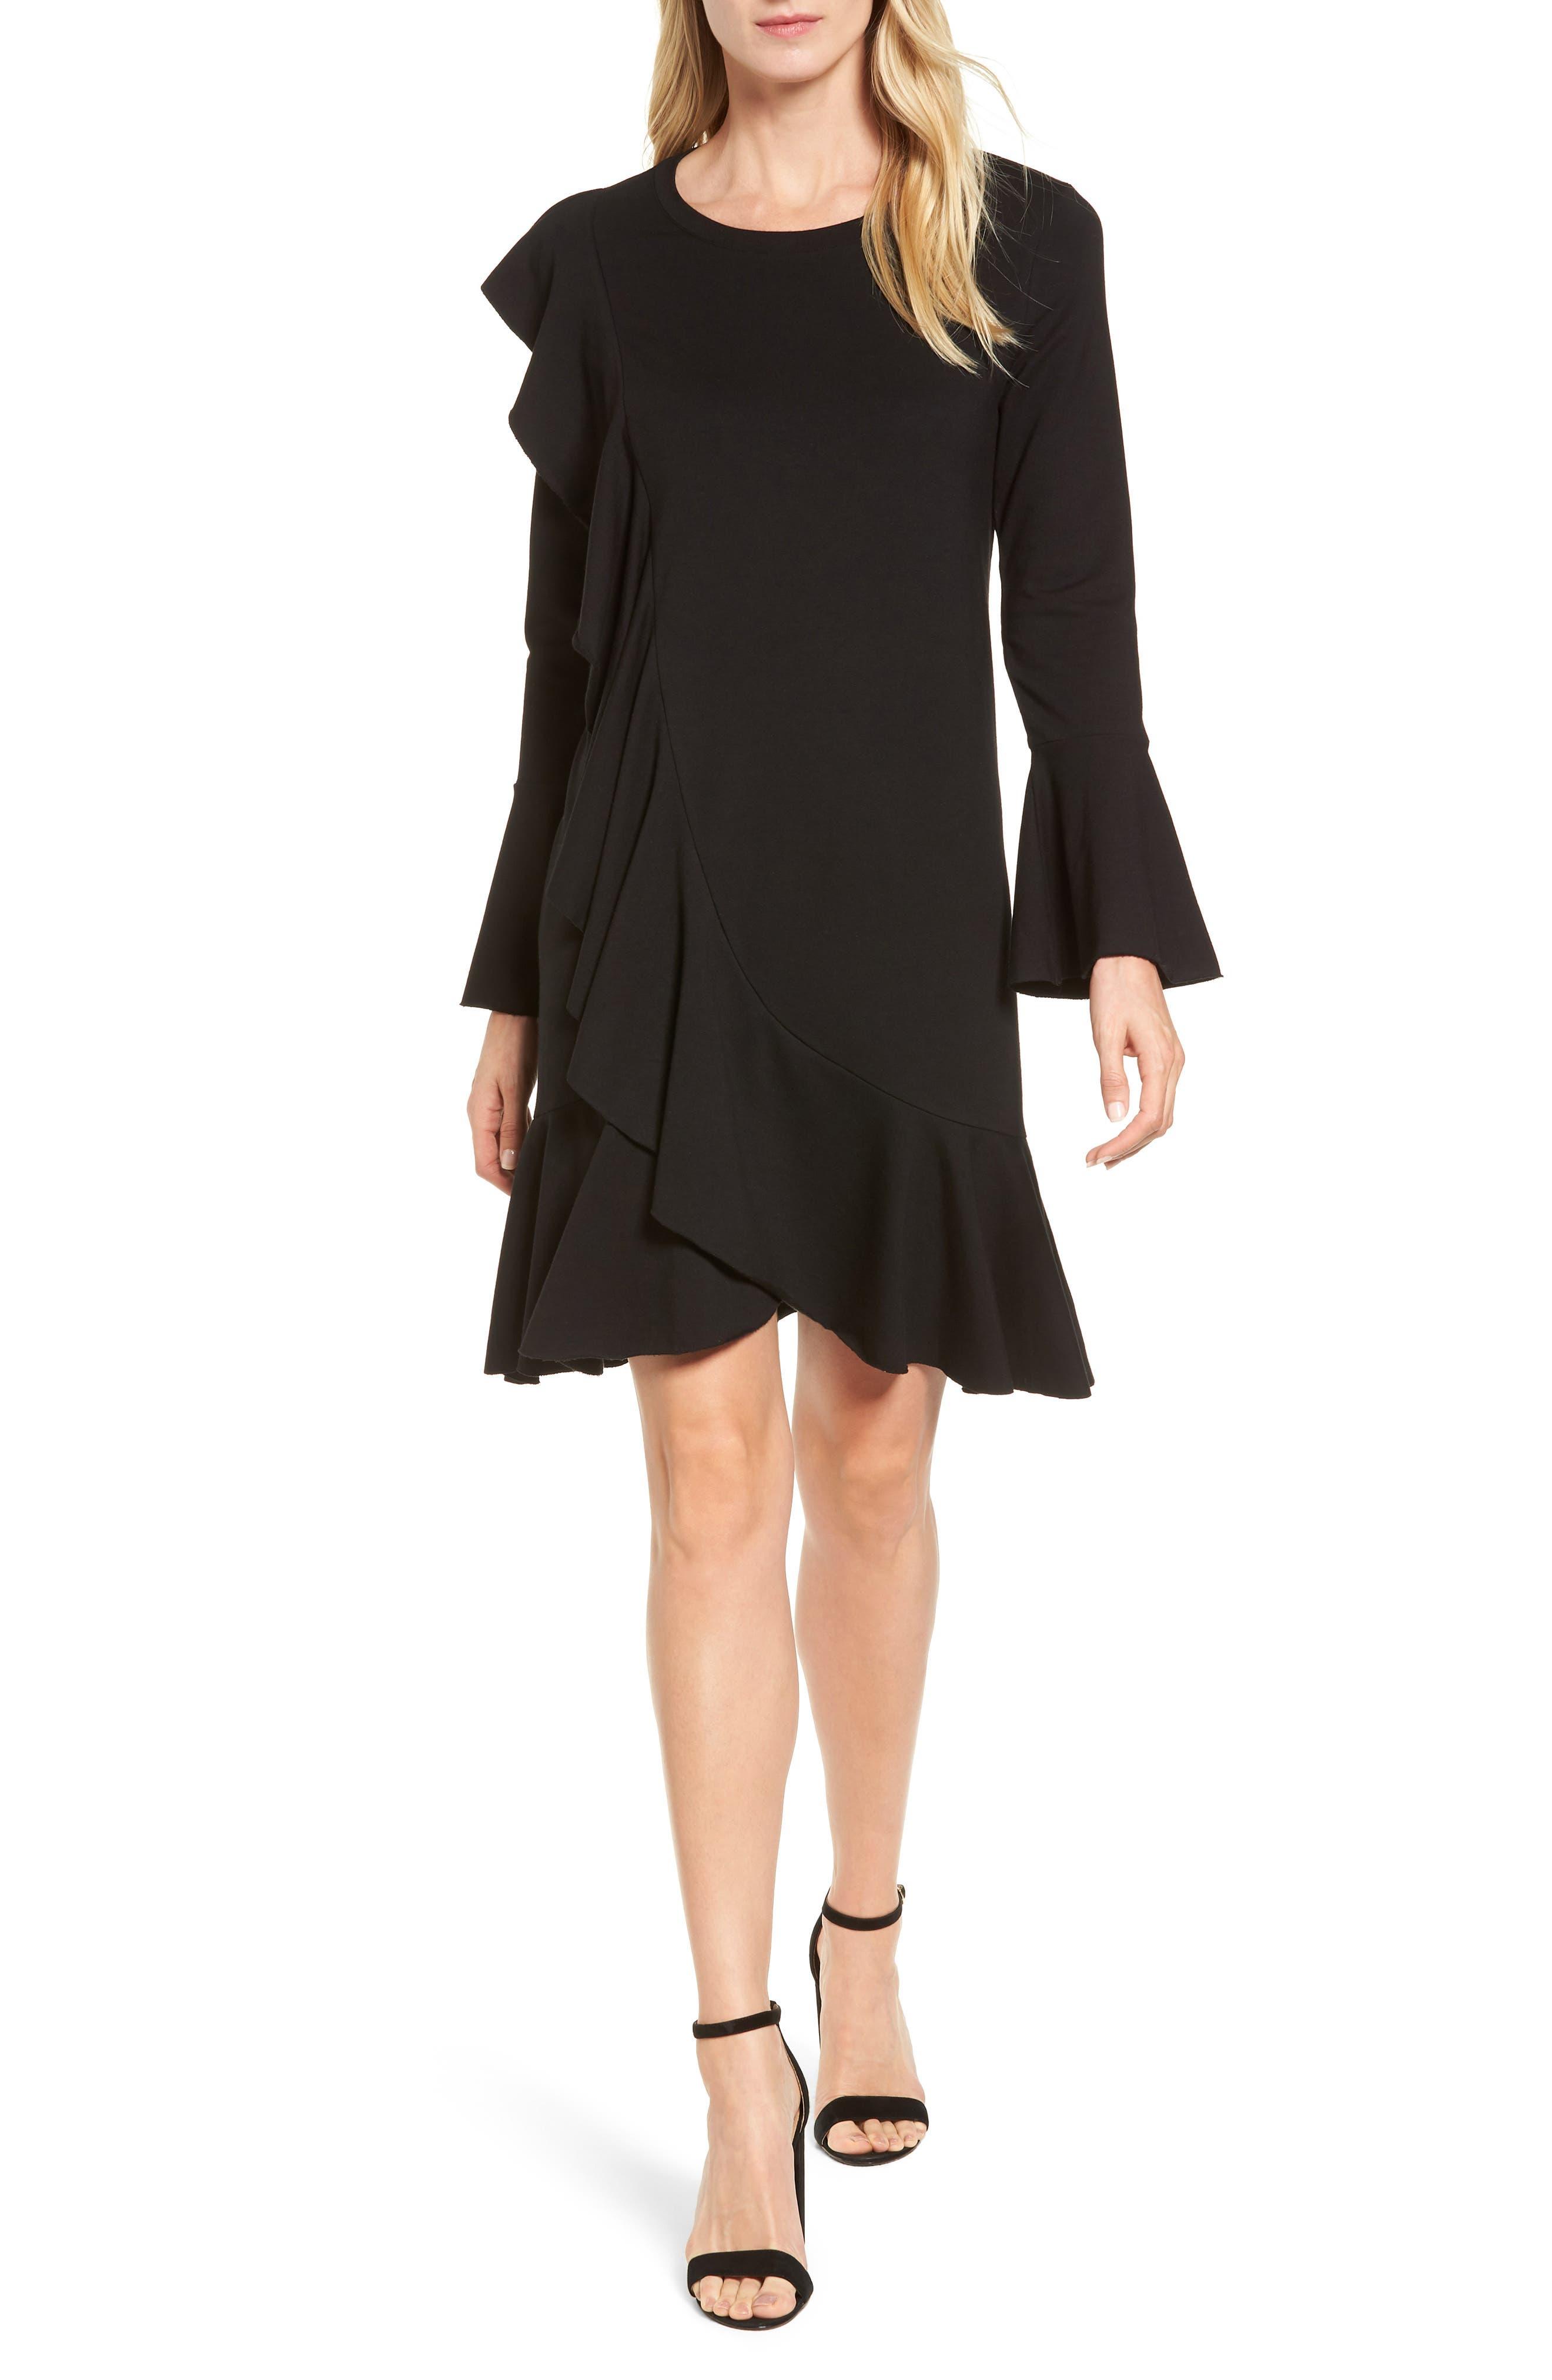 Ruffle Detail Knit Dress,                         Main,                         color, Black